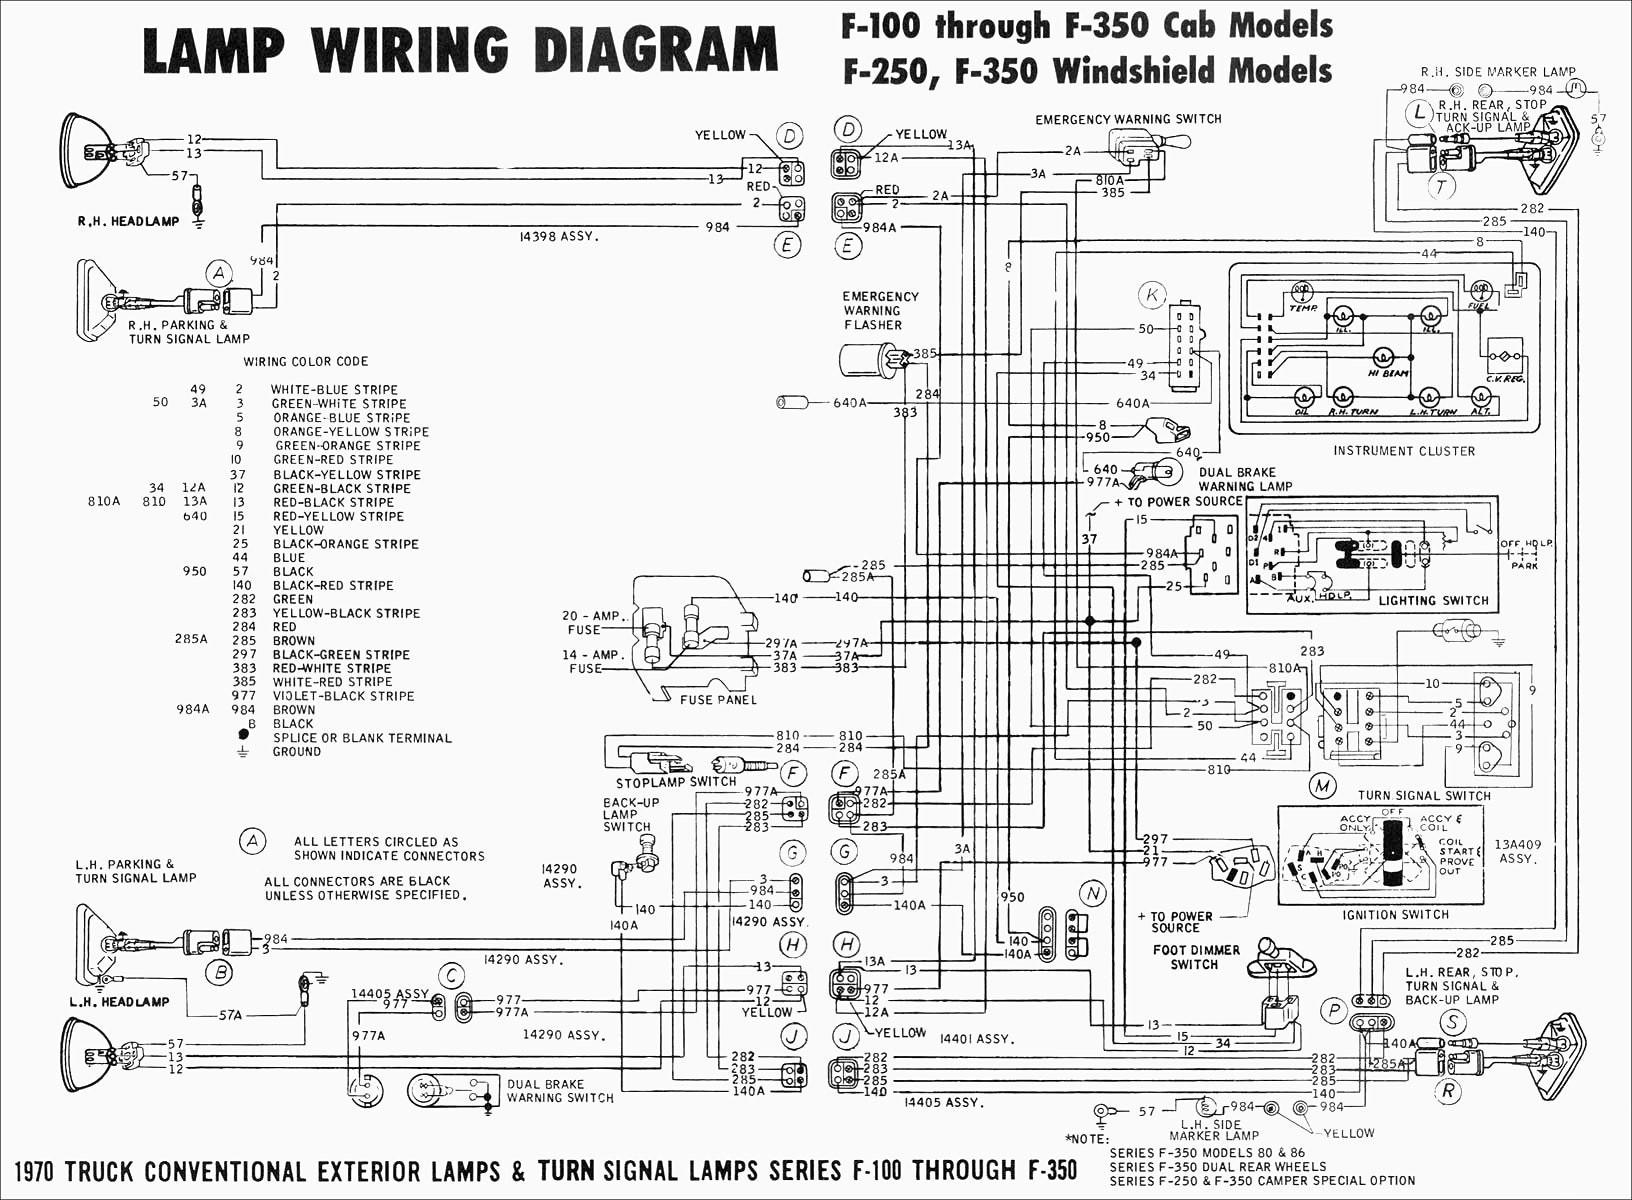 Best Of 2000 Chevy Silverado Brake Light Switch Wiring